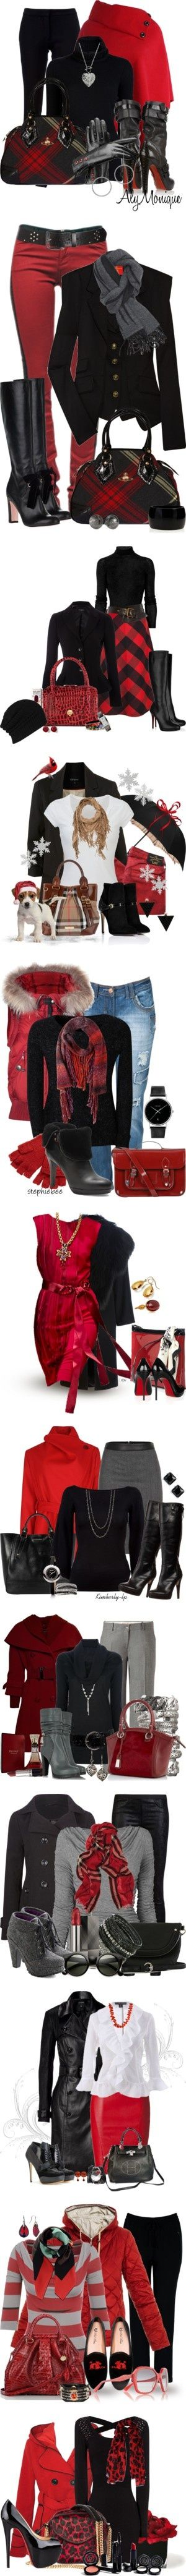 .I like the purse and the reds. https://www.fanprint.com/licenses/atlanta-falcons?ref=5750